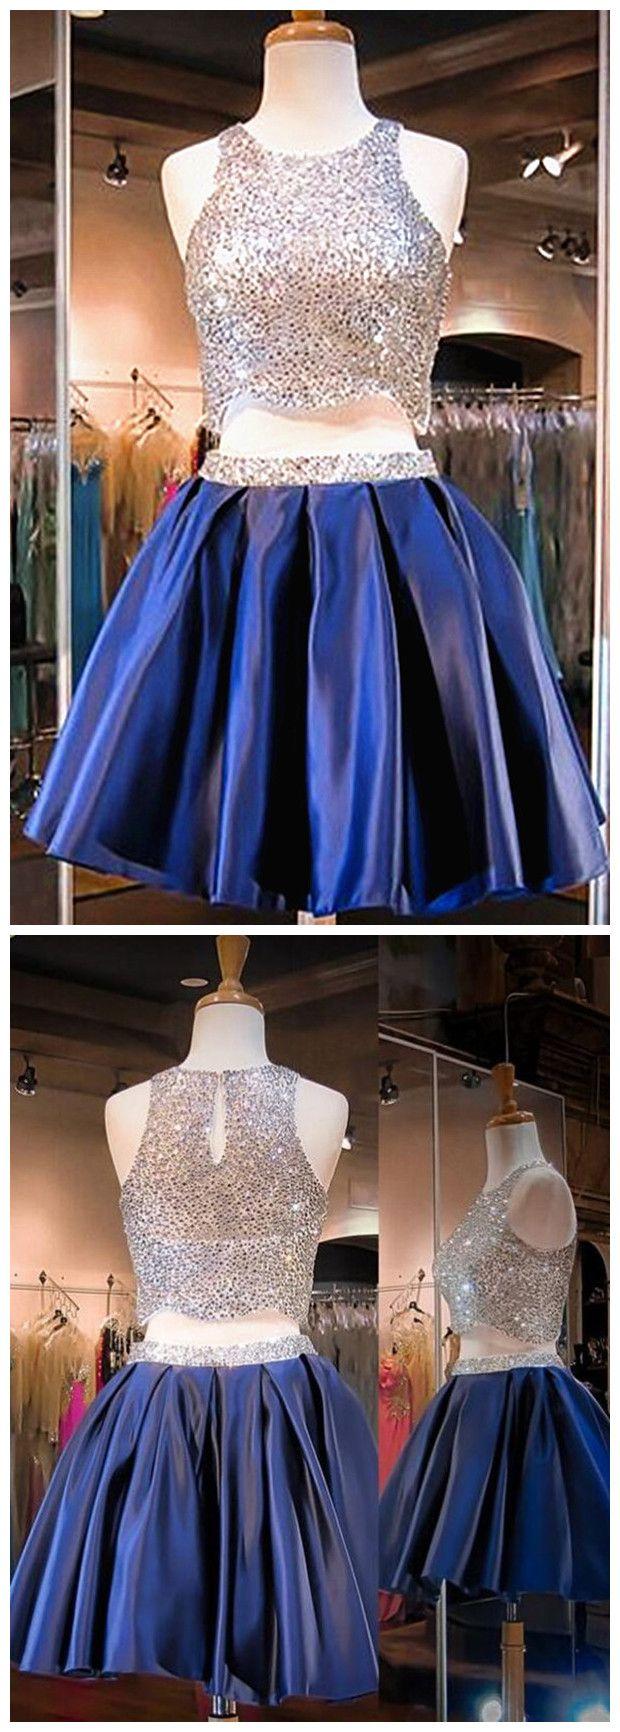 Navy Blue Homecoming Dress 2 Piece Beading Homecoming Gowns Short Bling Homecoming Dress 2 Pieces Cocktail Dress Evening Gowns Satin Cocktail Dress Satin Homecoming Dress Tulle Homecoming Dress [ 1732 x 620 Pixel ]